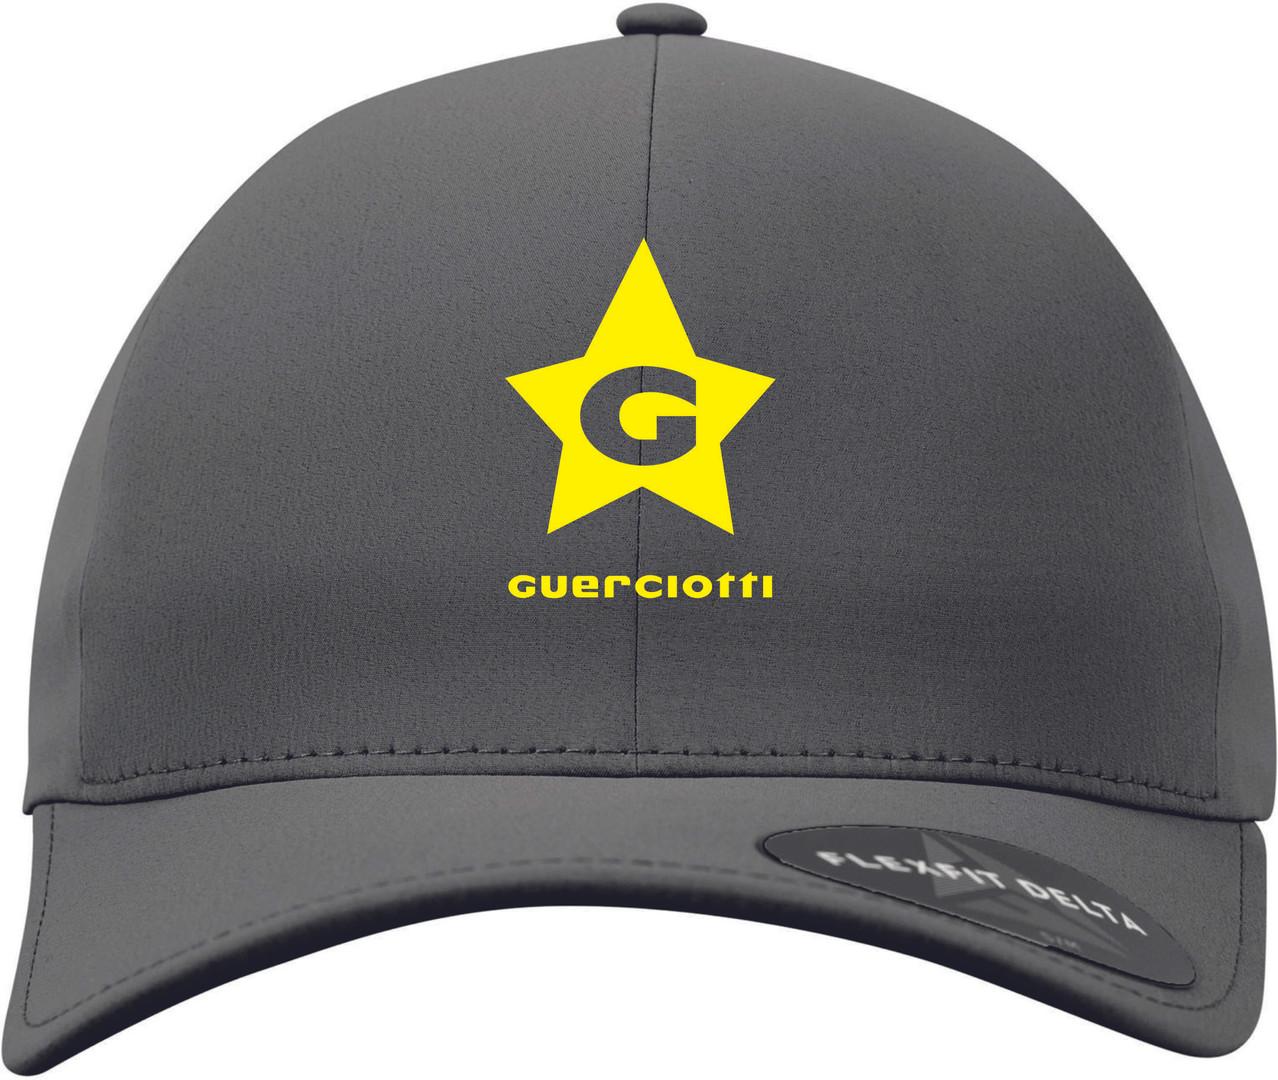 casquette Guerciotti.jpg